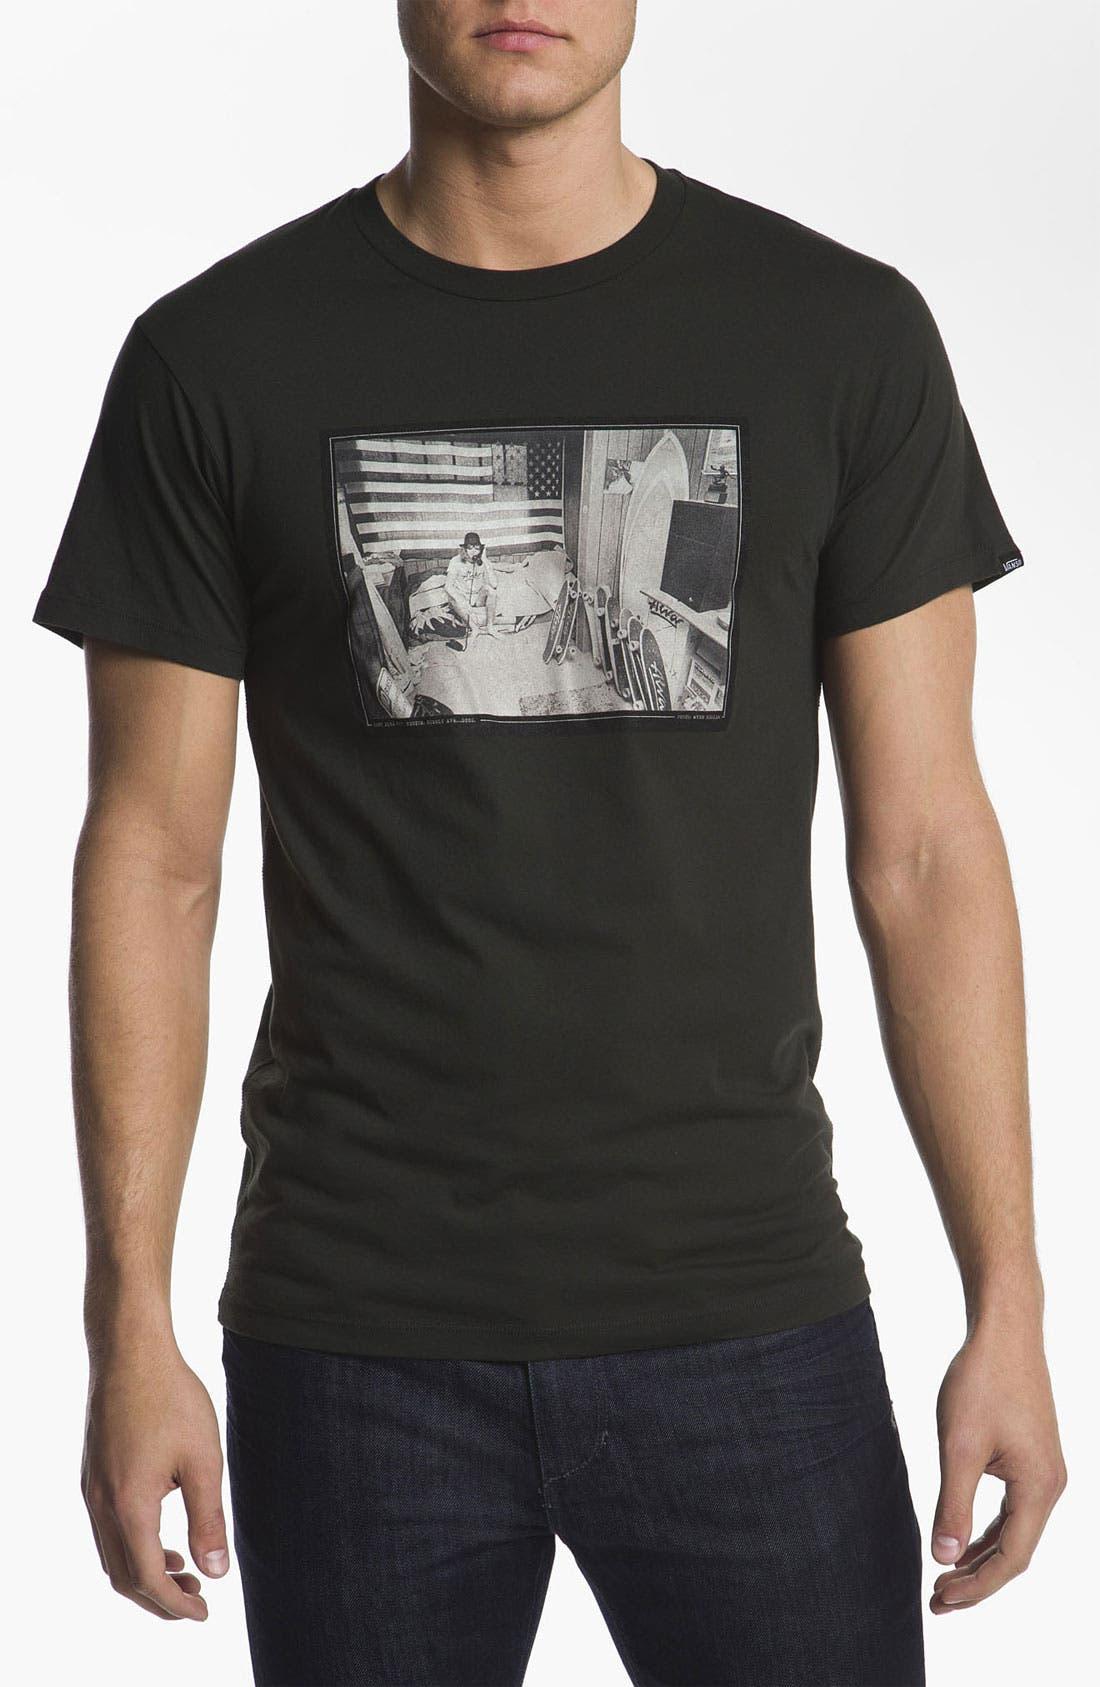 Alternate Image 1 Selected - Vans 'Legends: Alva' T-Shirt